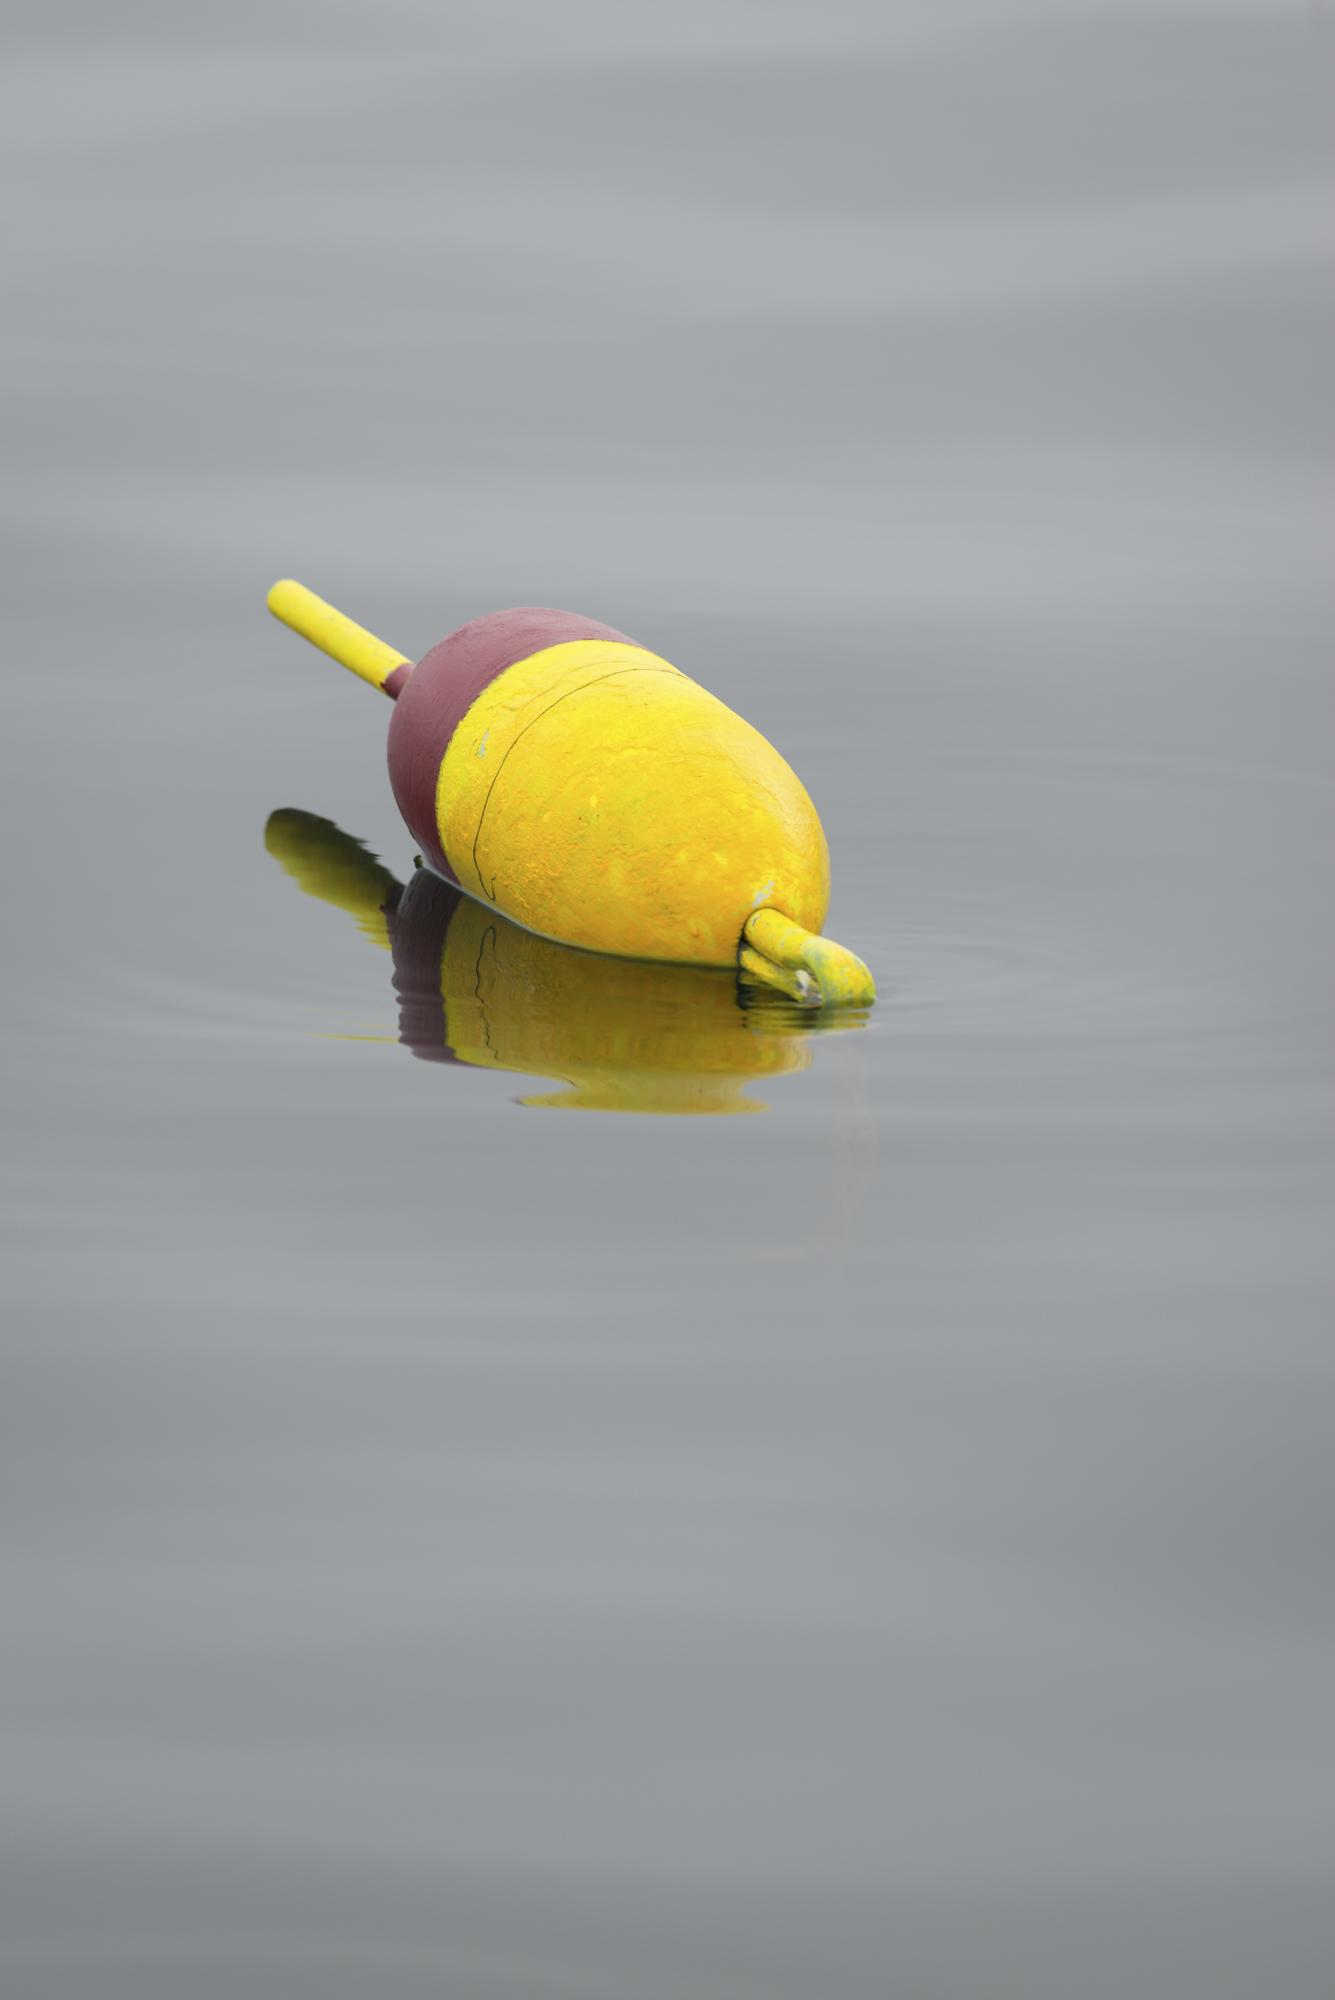 Quiet lobster buoy off the coast of Mount Desert Island, Maine